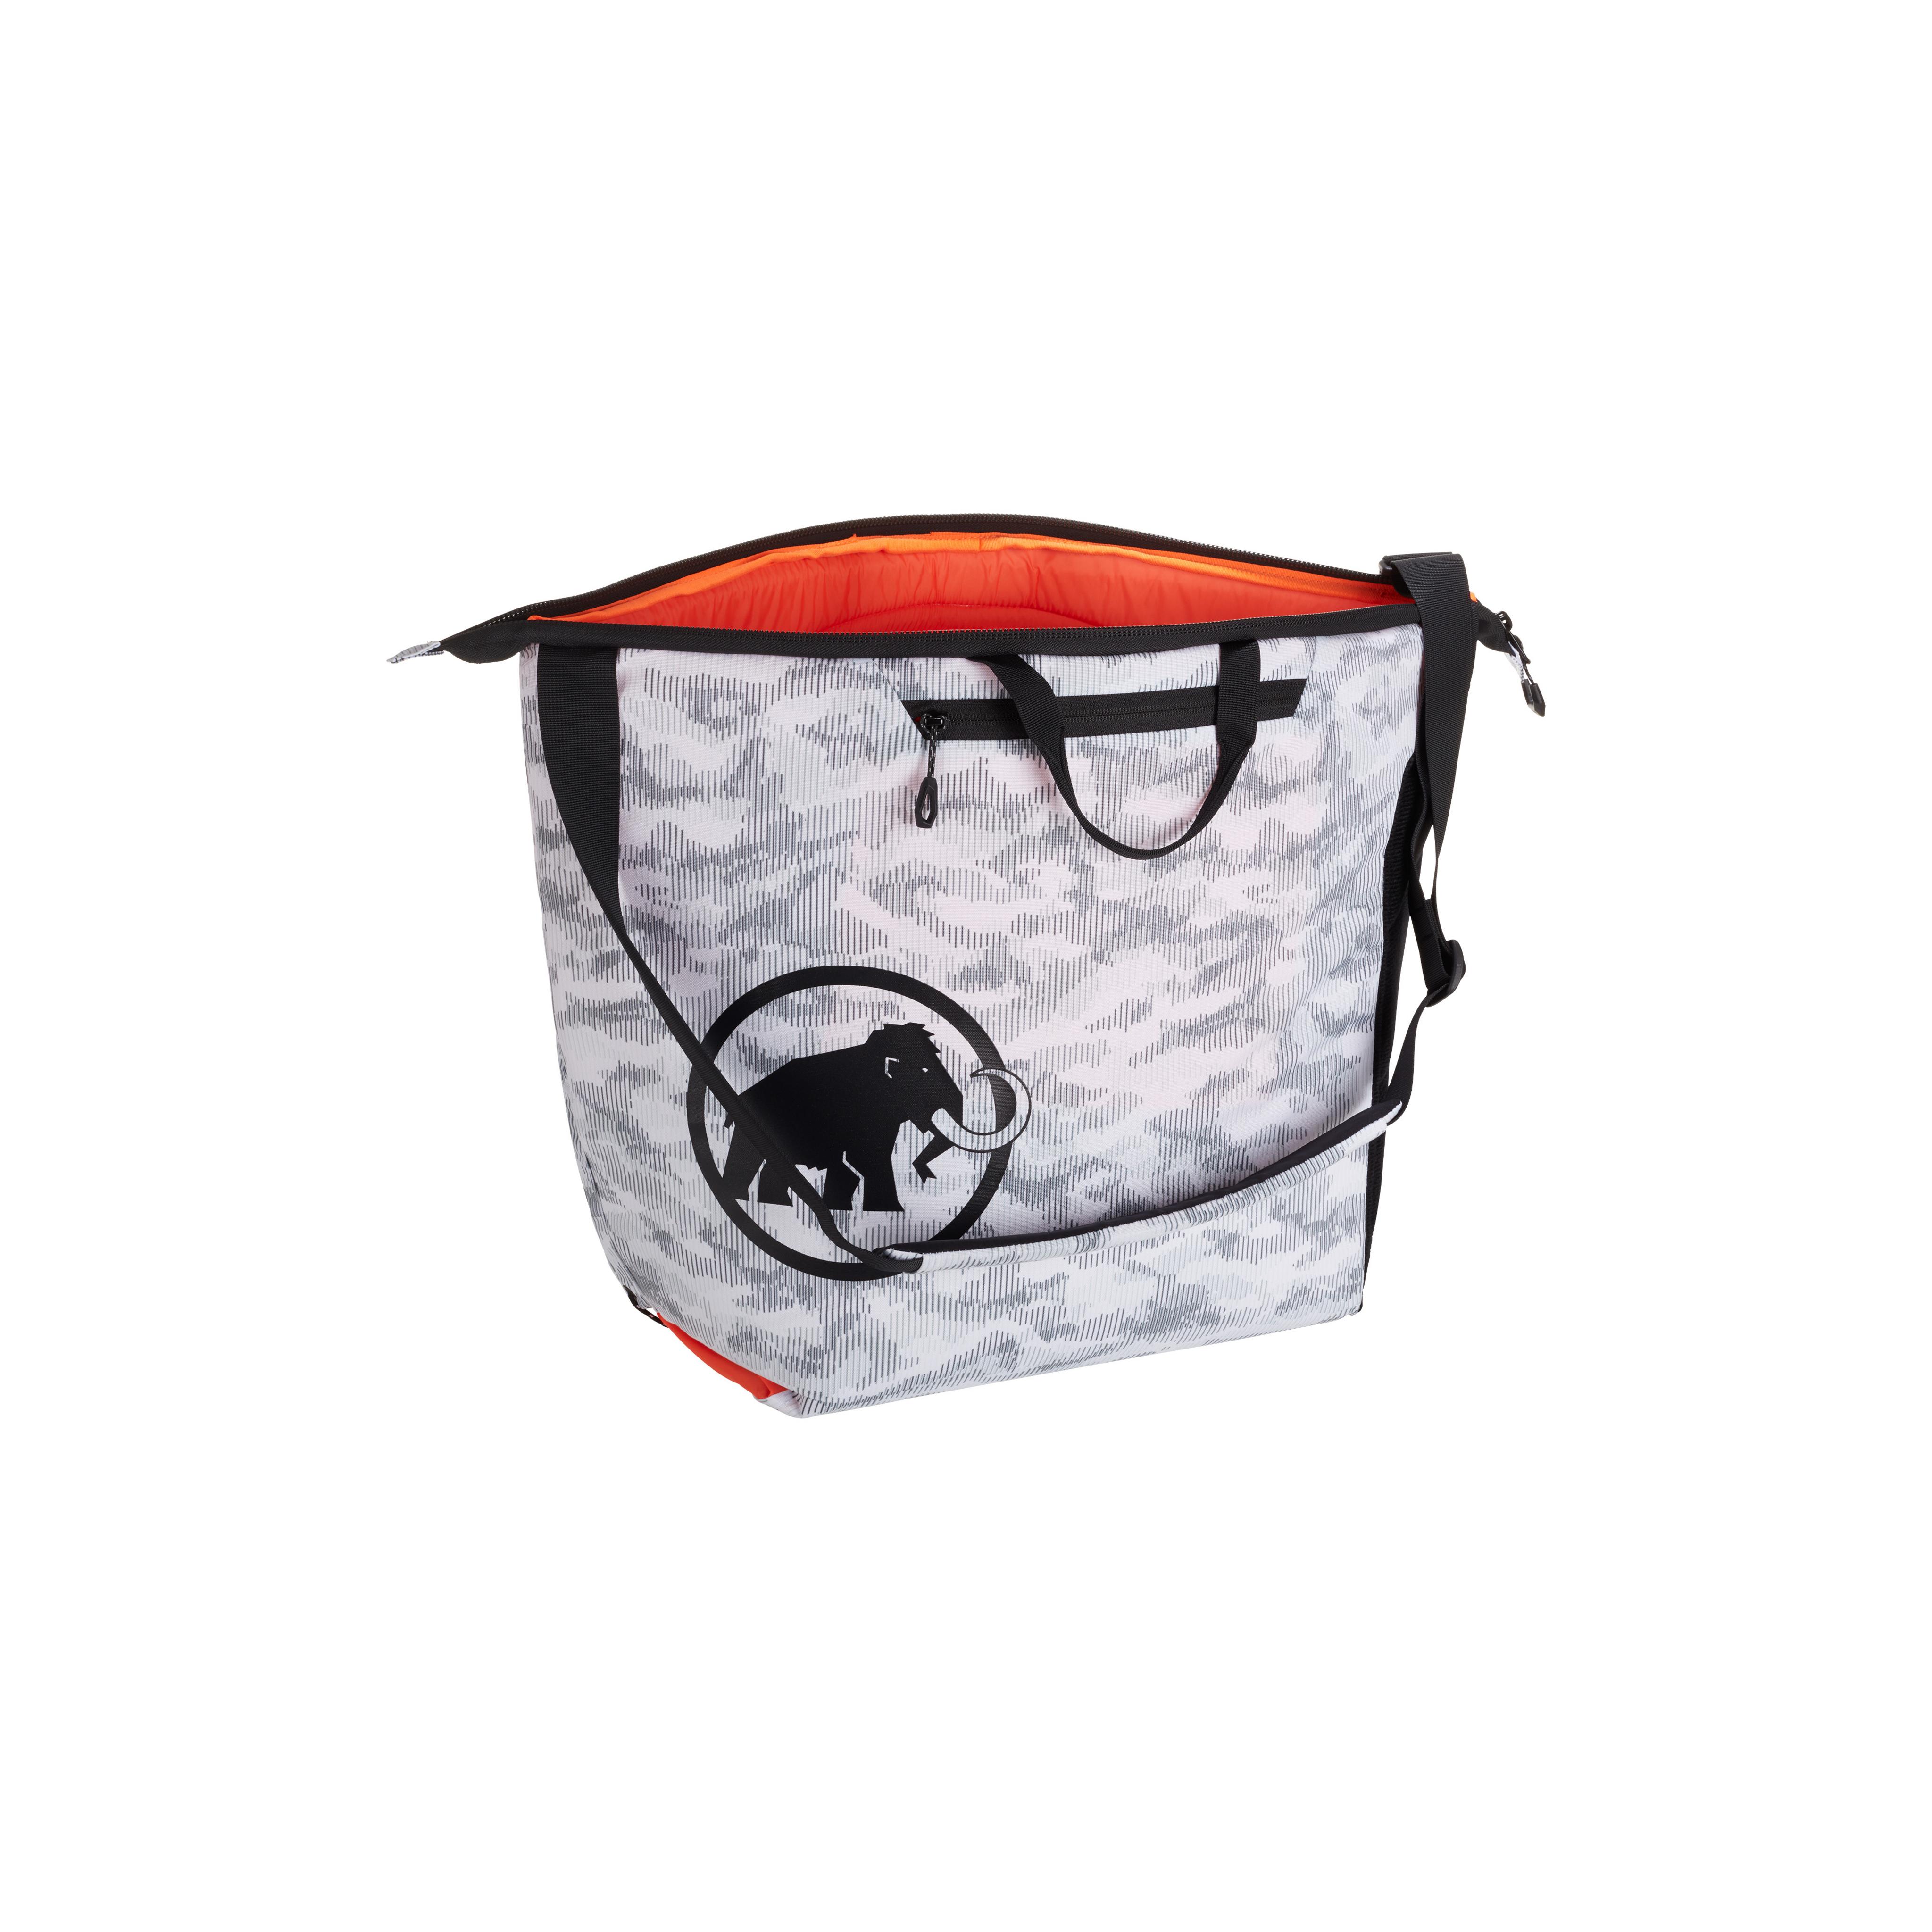 Magic Boulder Bag X - one size, white camo product image